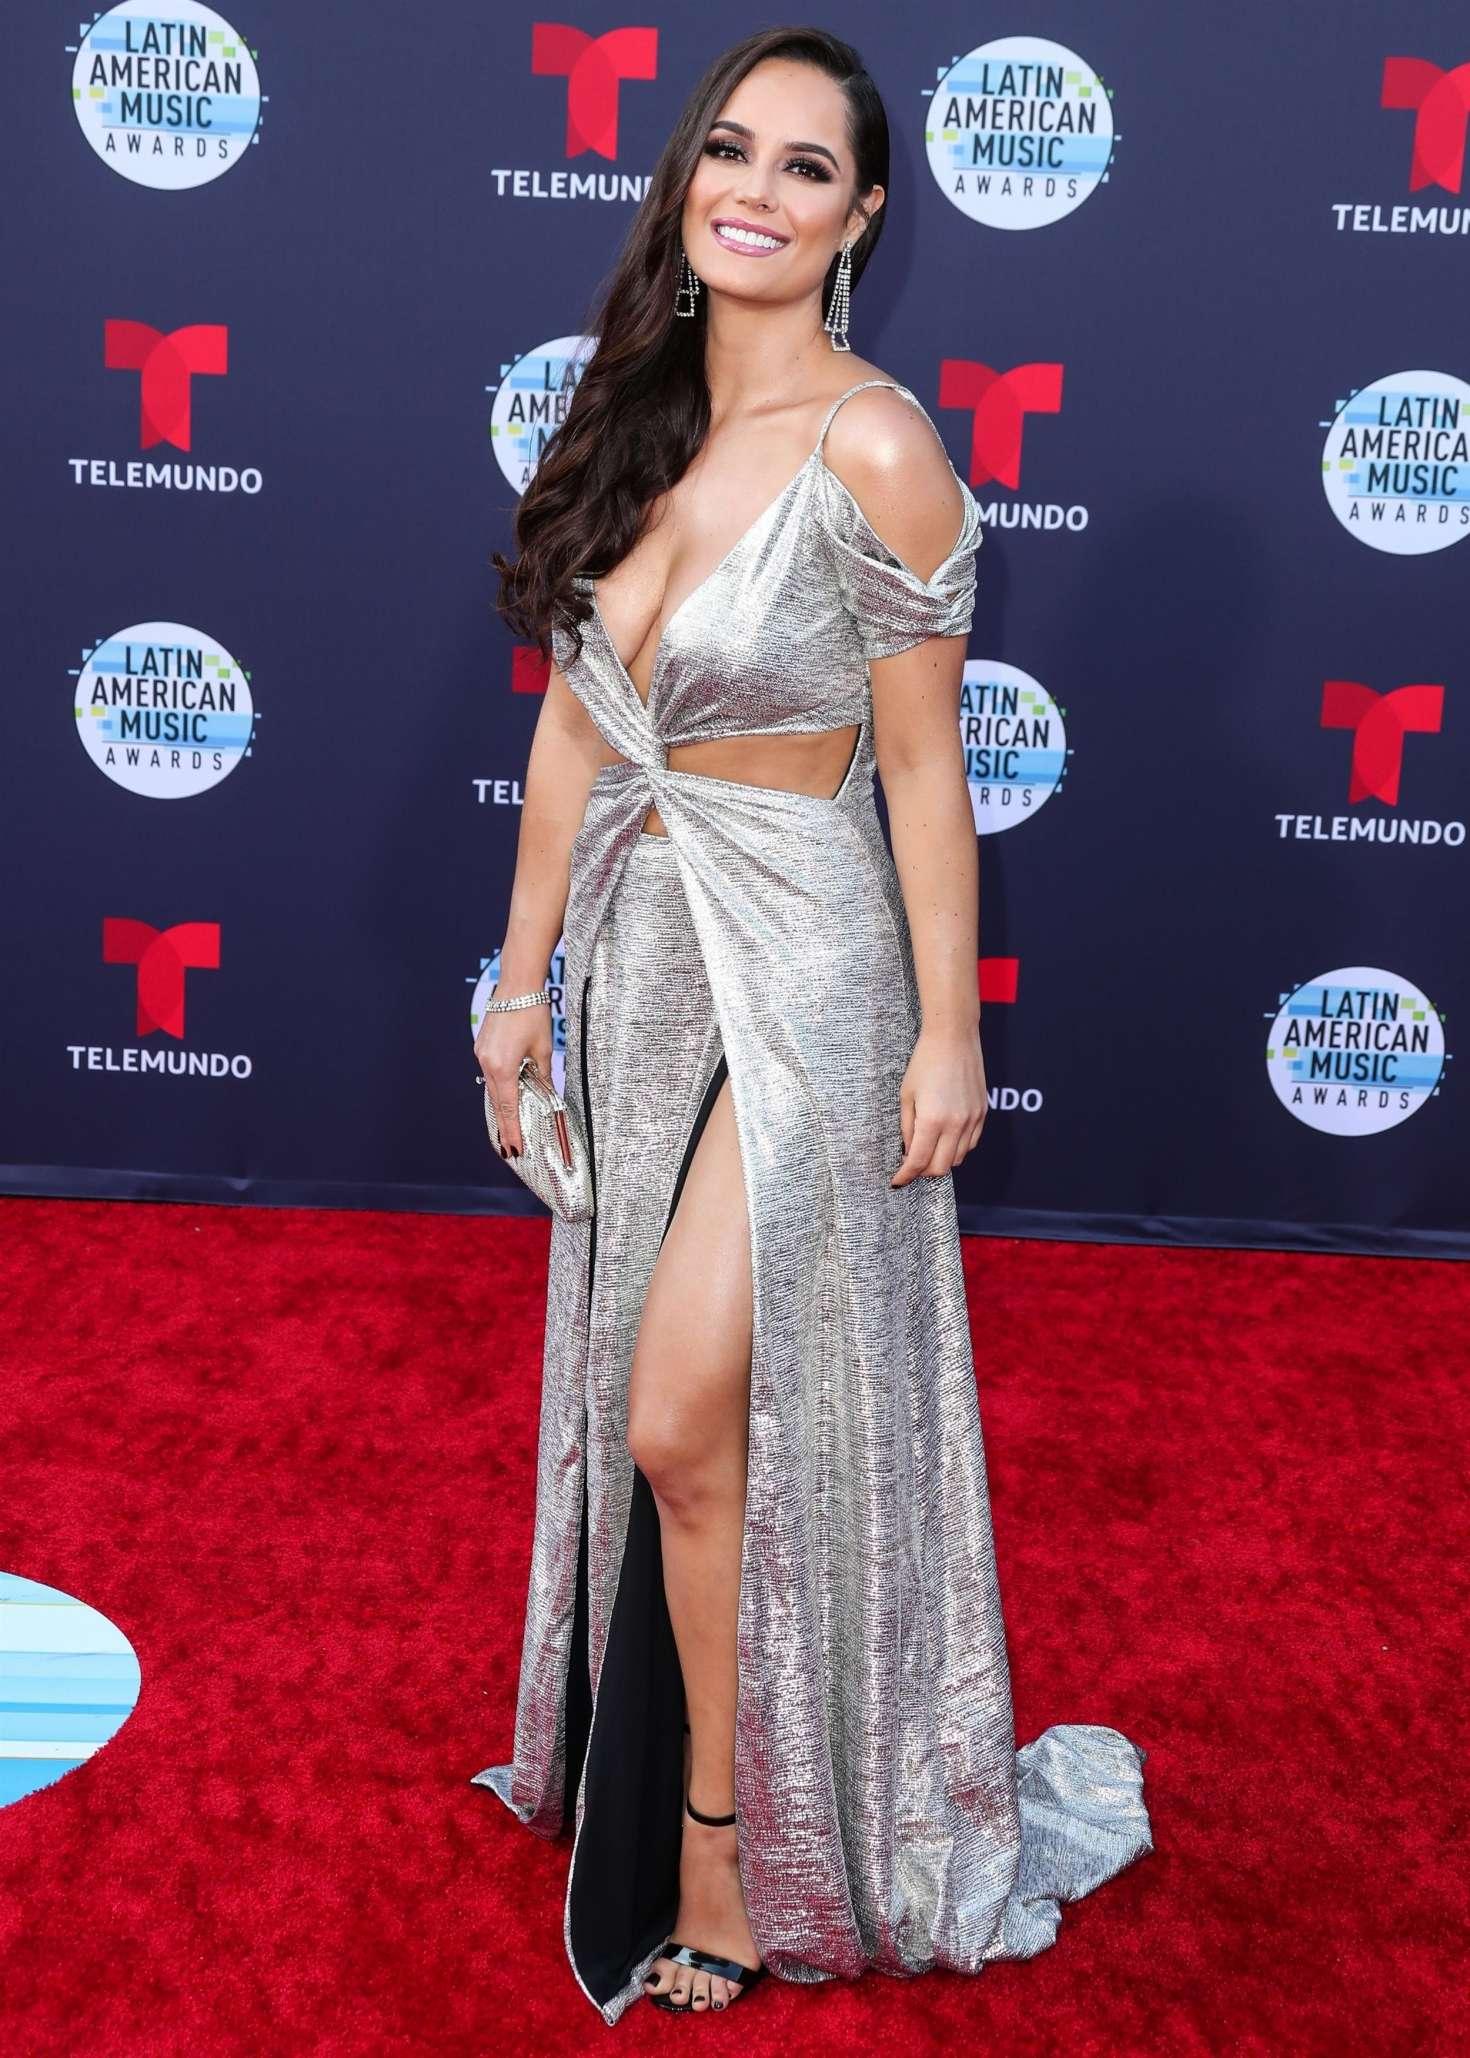 Ana Lucia Dominguez 2018 : Ana Lucia Dominguez: 2018 Latin American Music Awards -08